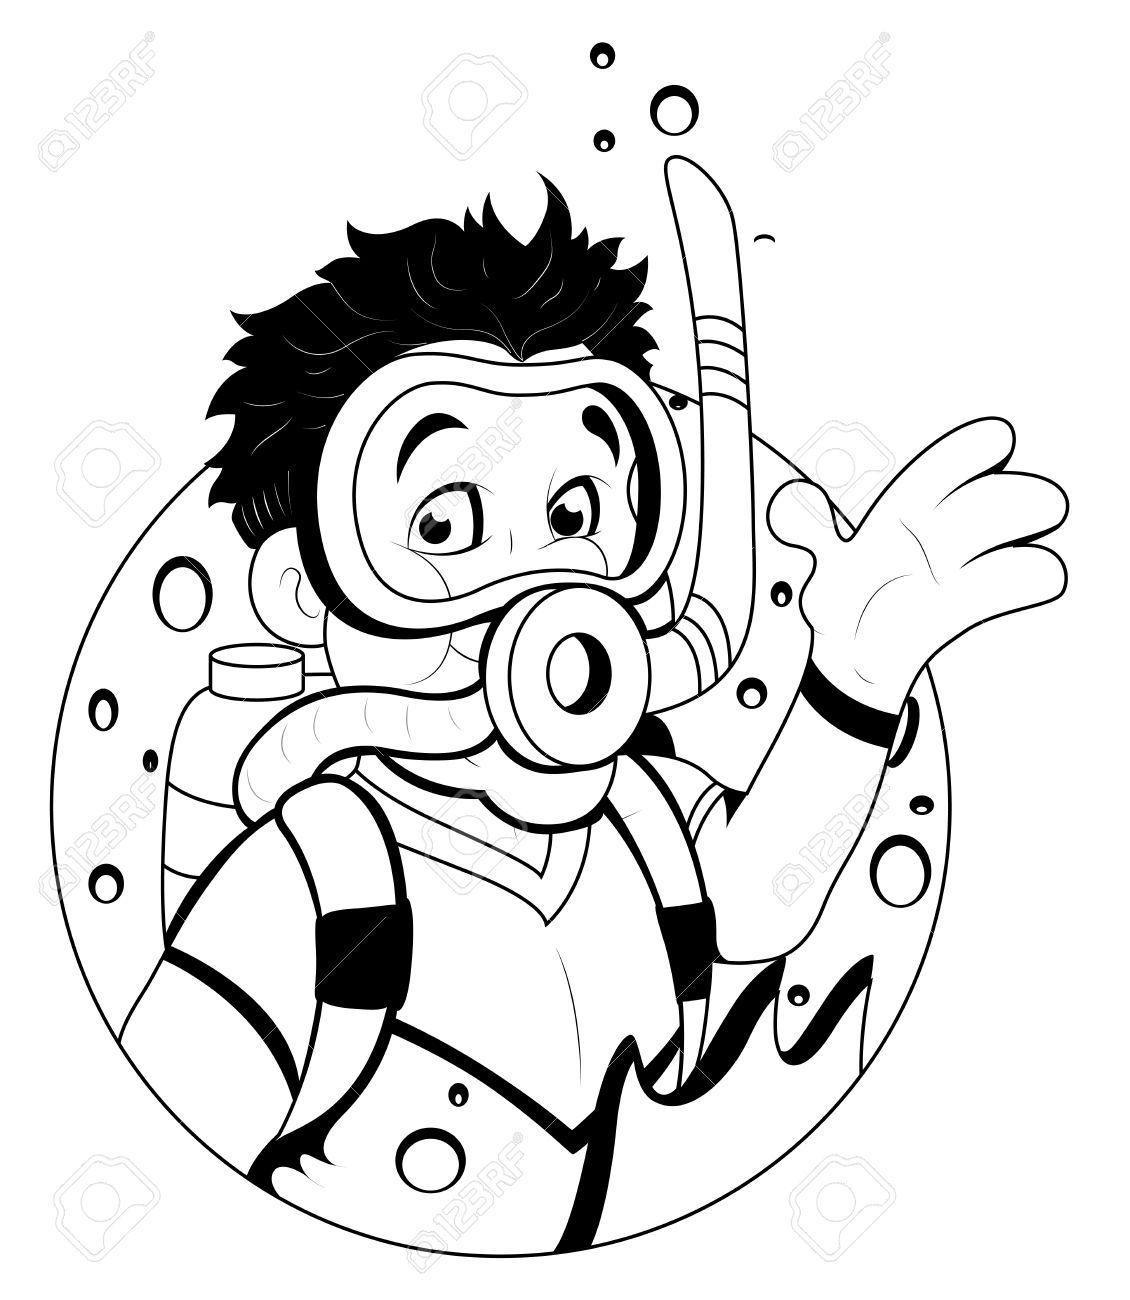 Cartoon Scuba Diver Scuba Diver Cartoon Scuba